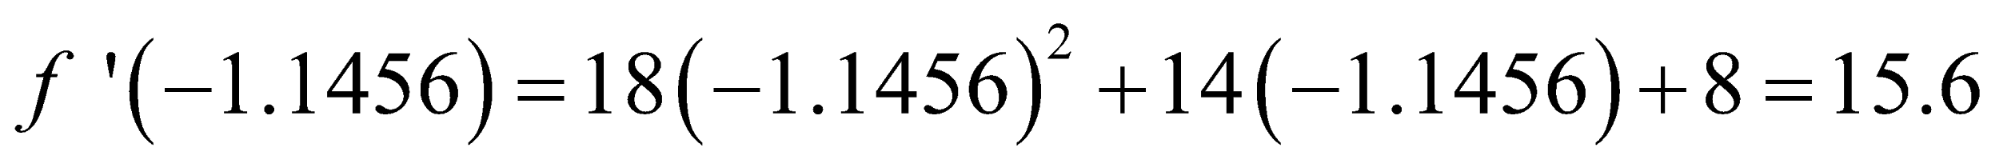 image86.png